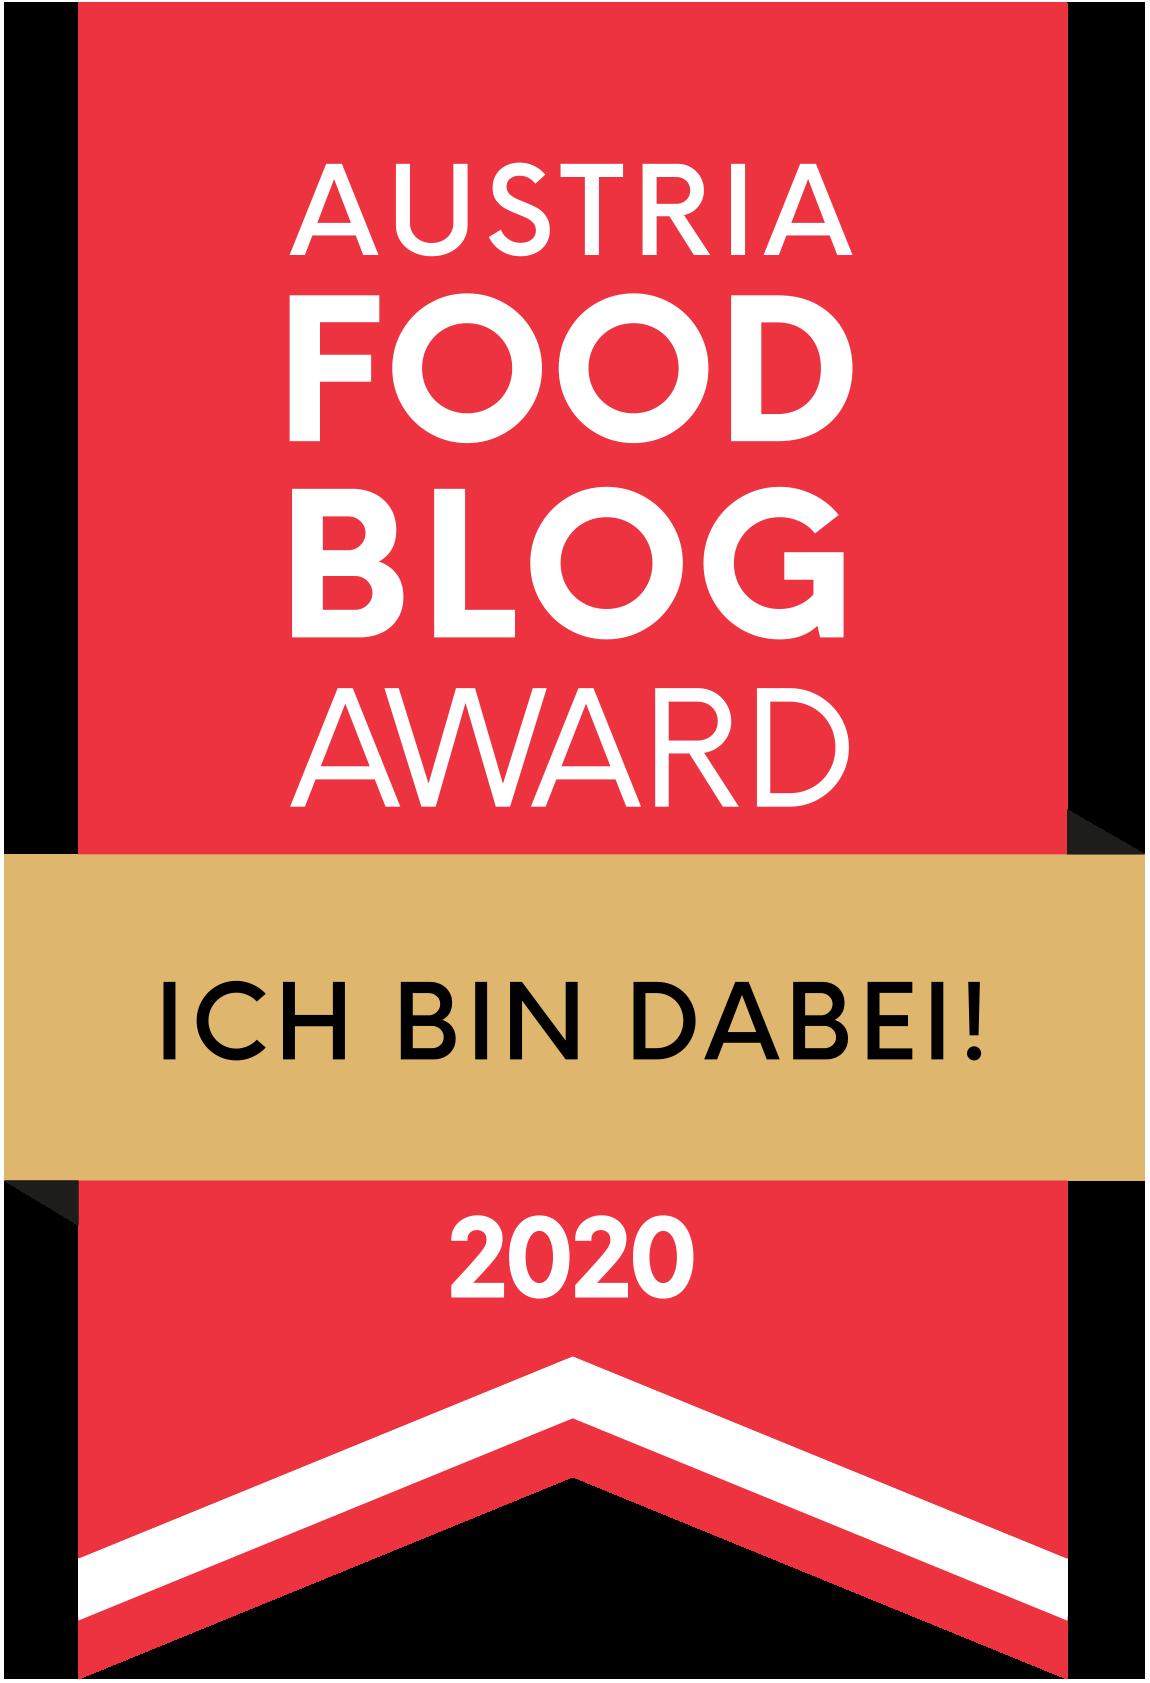 Austria FOOD BLOG Award